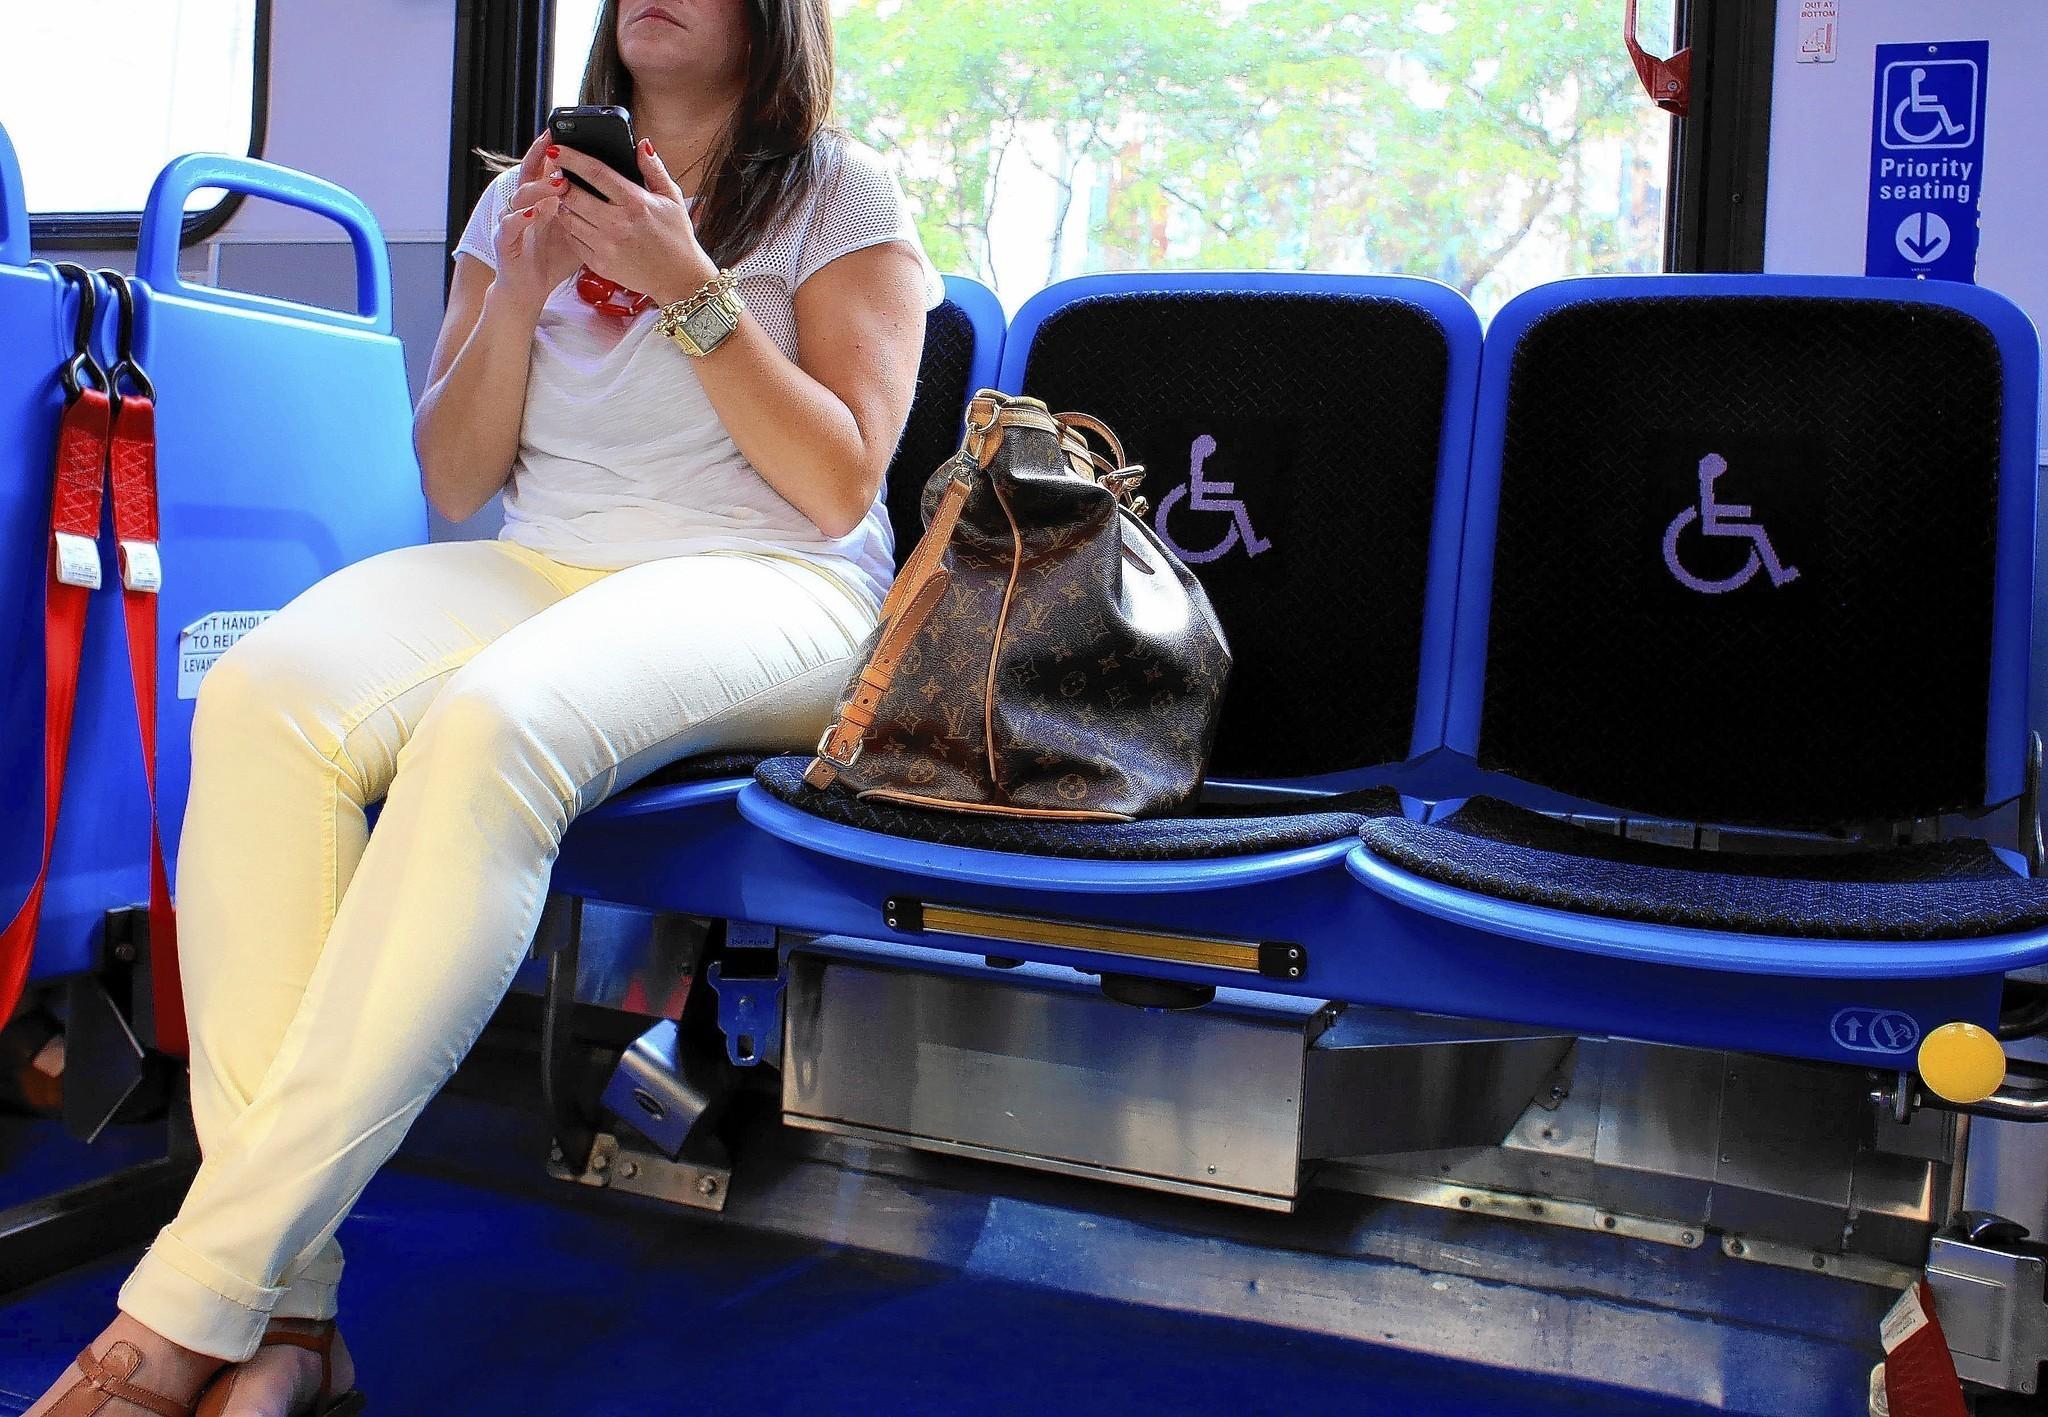 Telecommuting 8 Rules to Make It Work  Inccom